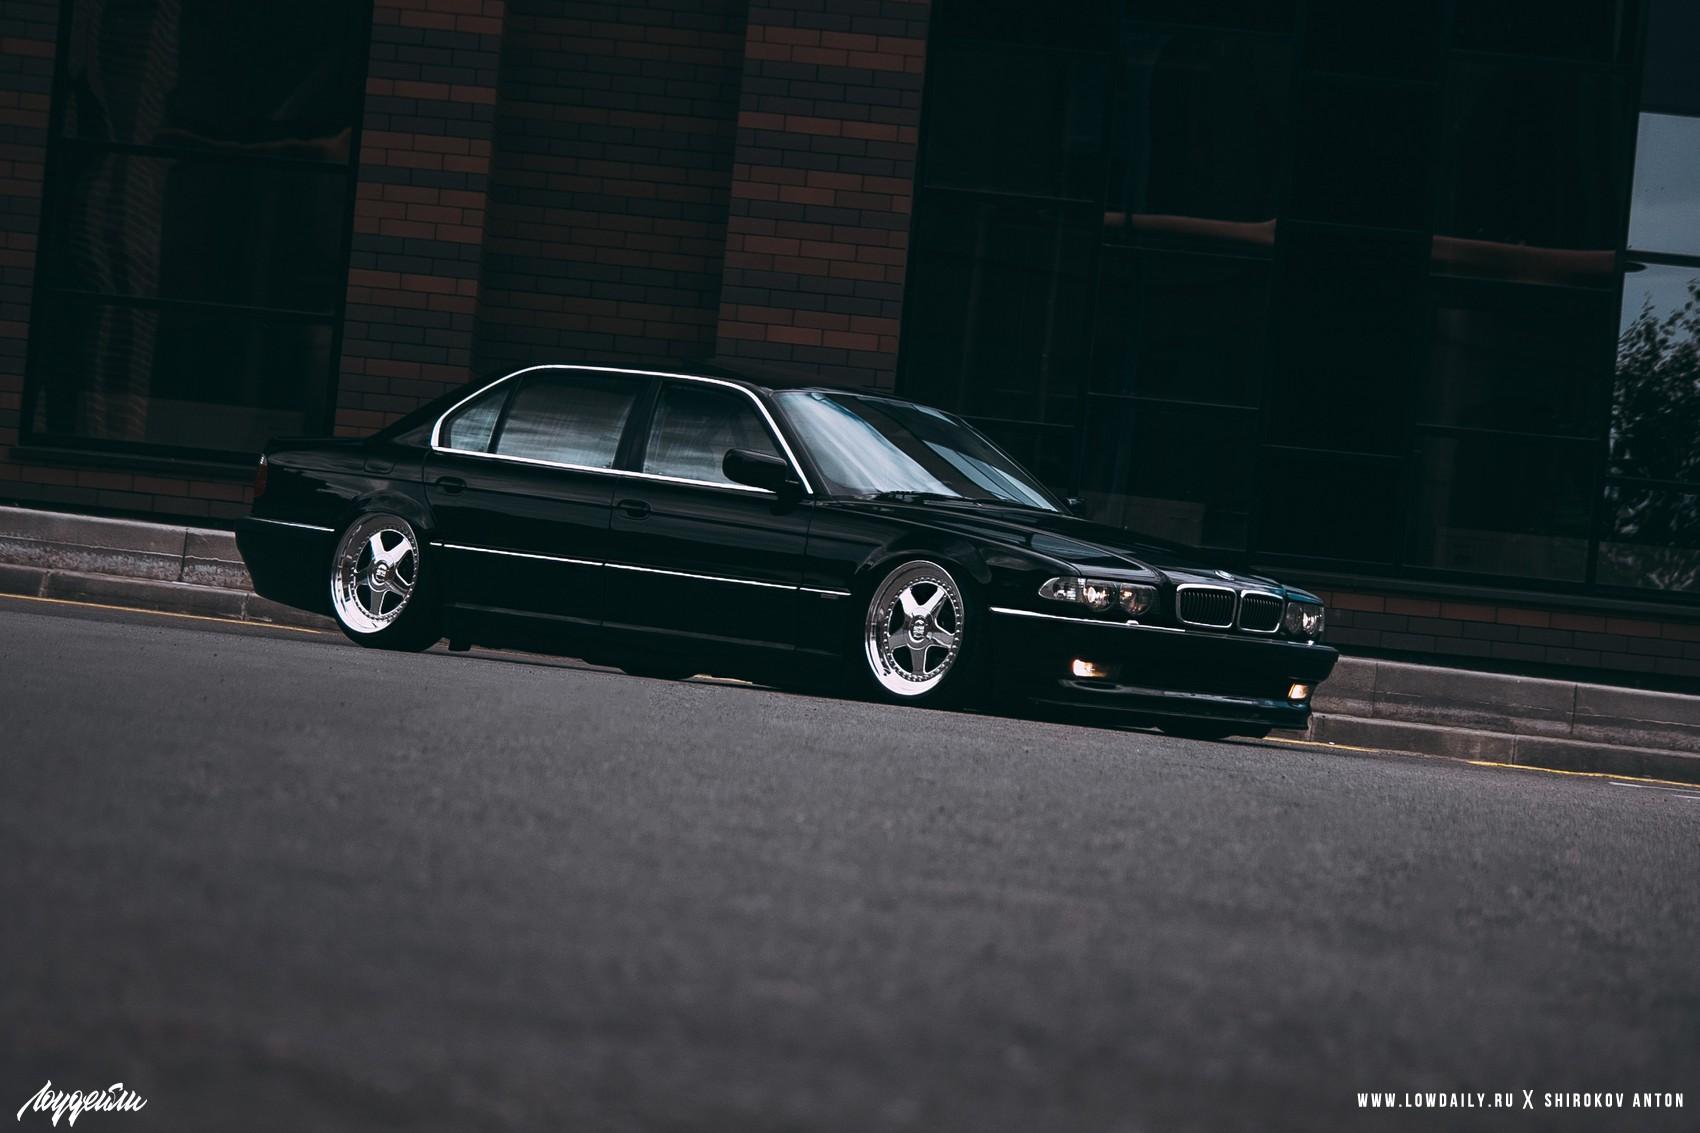 BMW E38 Lowdaily _MG_7007